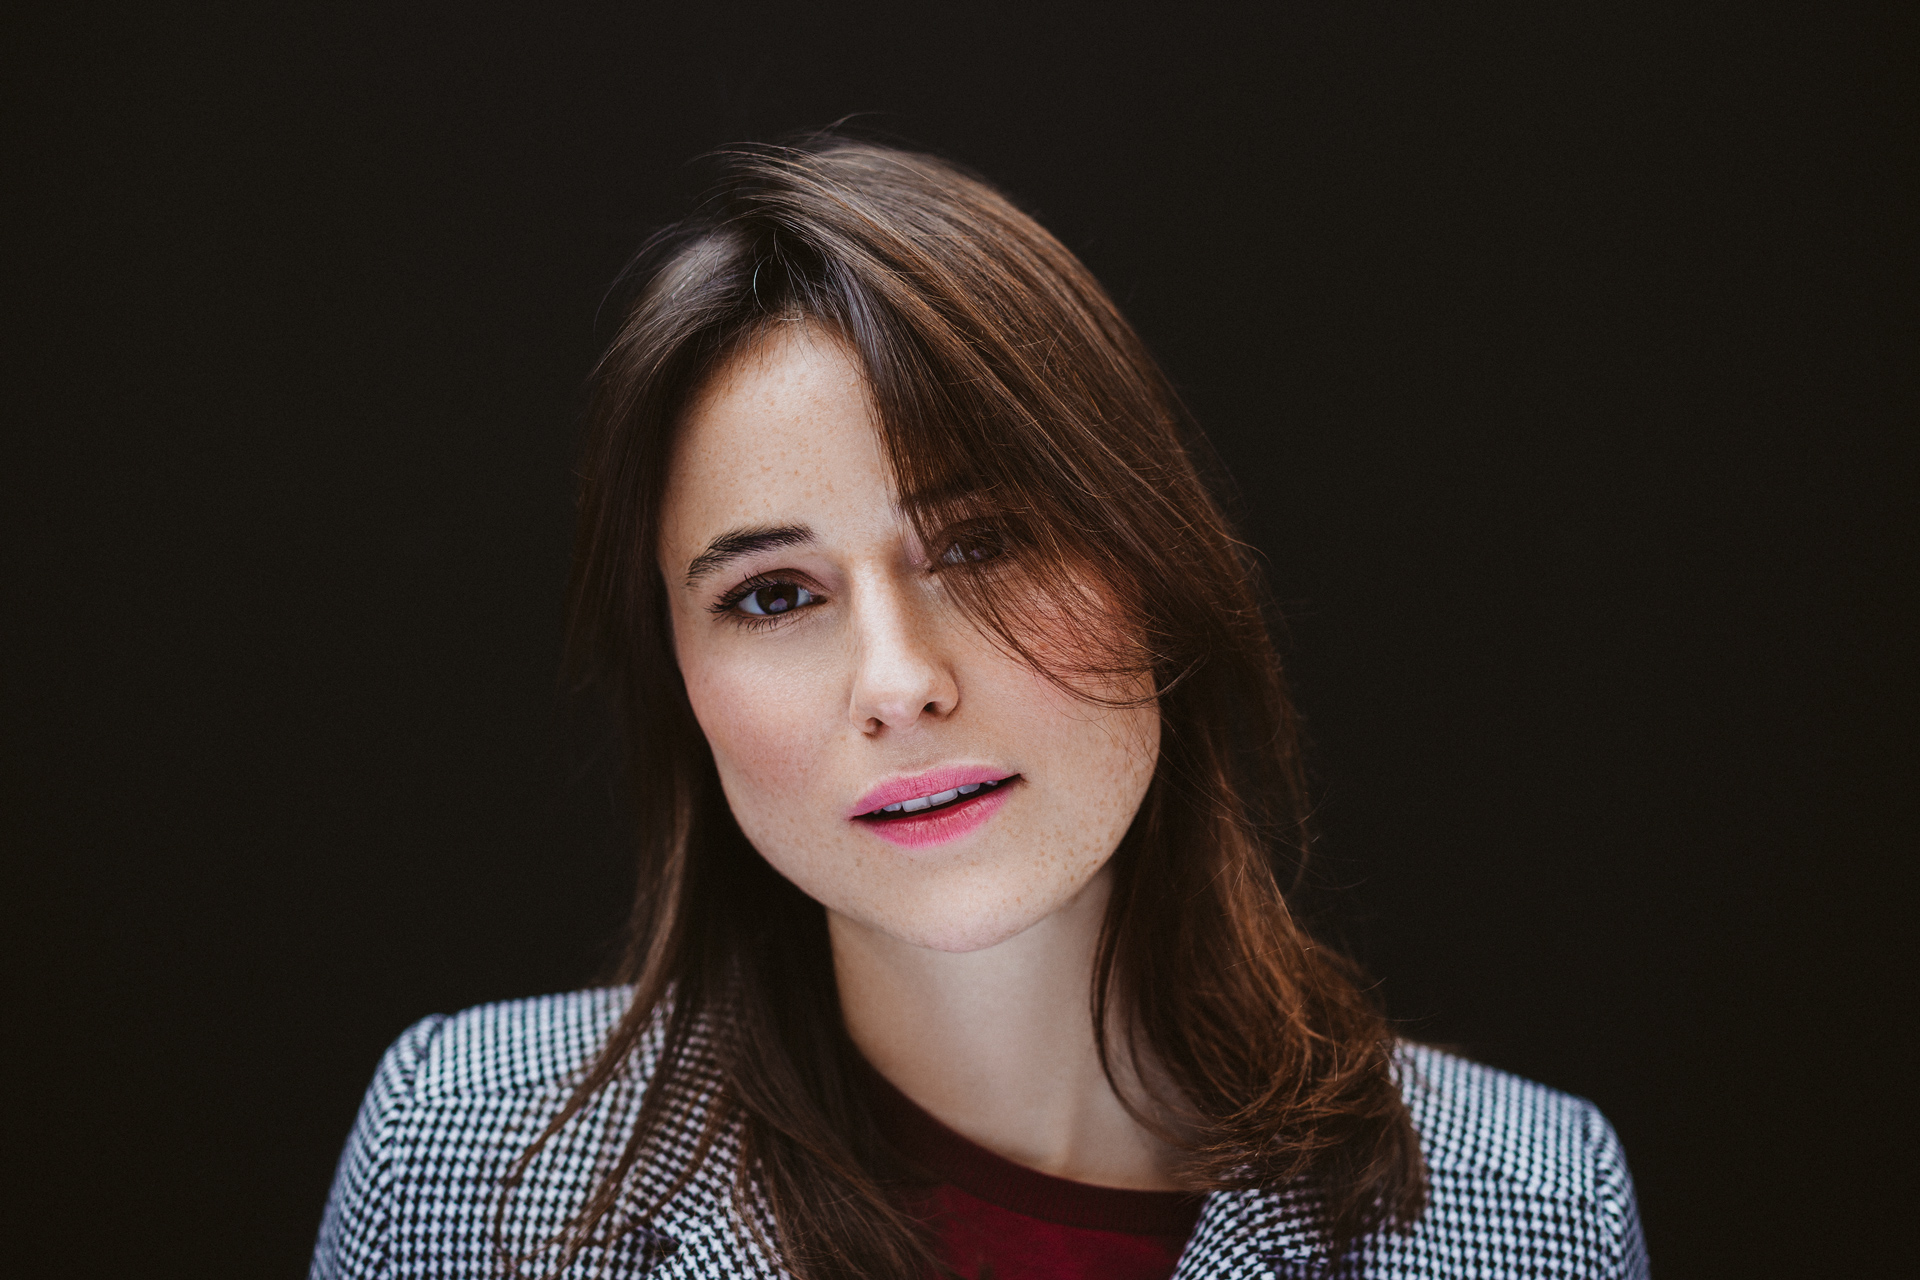 Lena Lademann